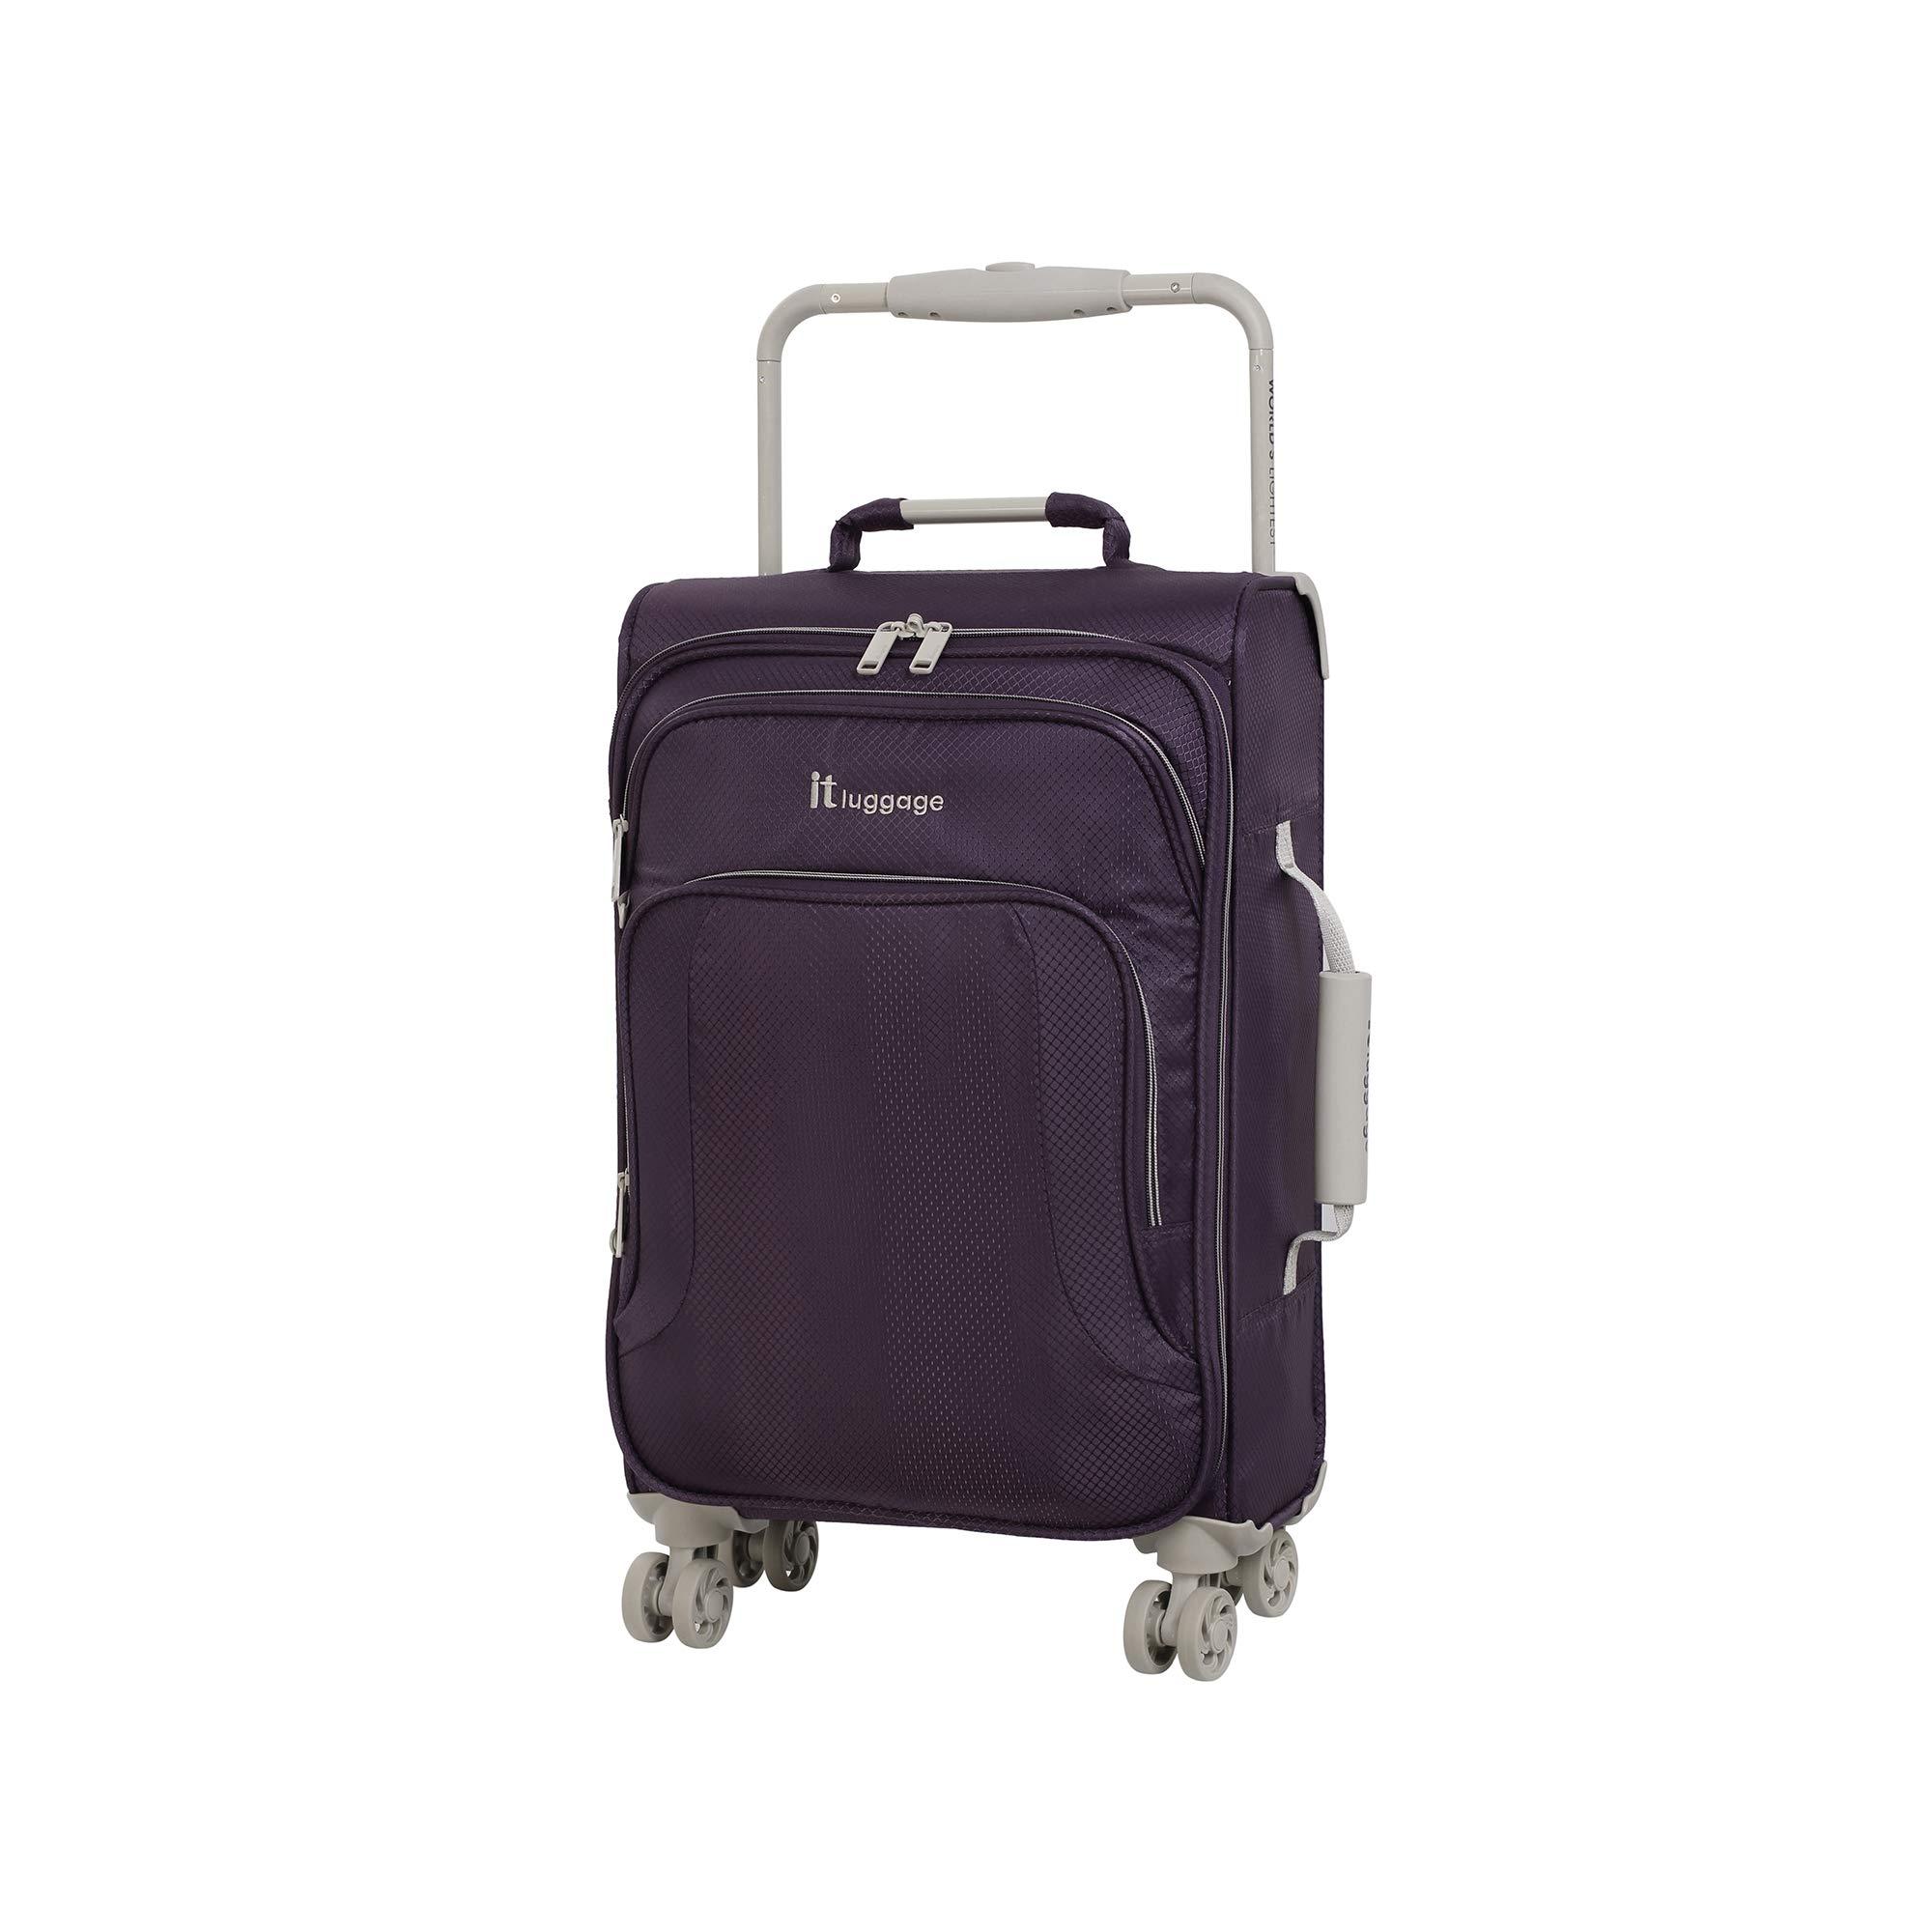 IT Luggage 22'' World's Lightest 8 Wheel Spinner, Purple Pennant With Cobblestone Trim